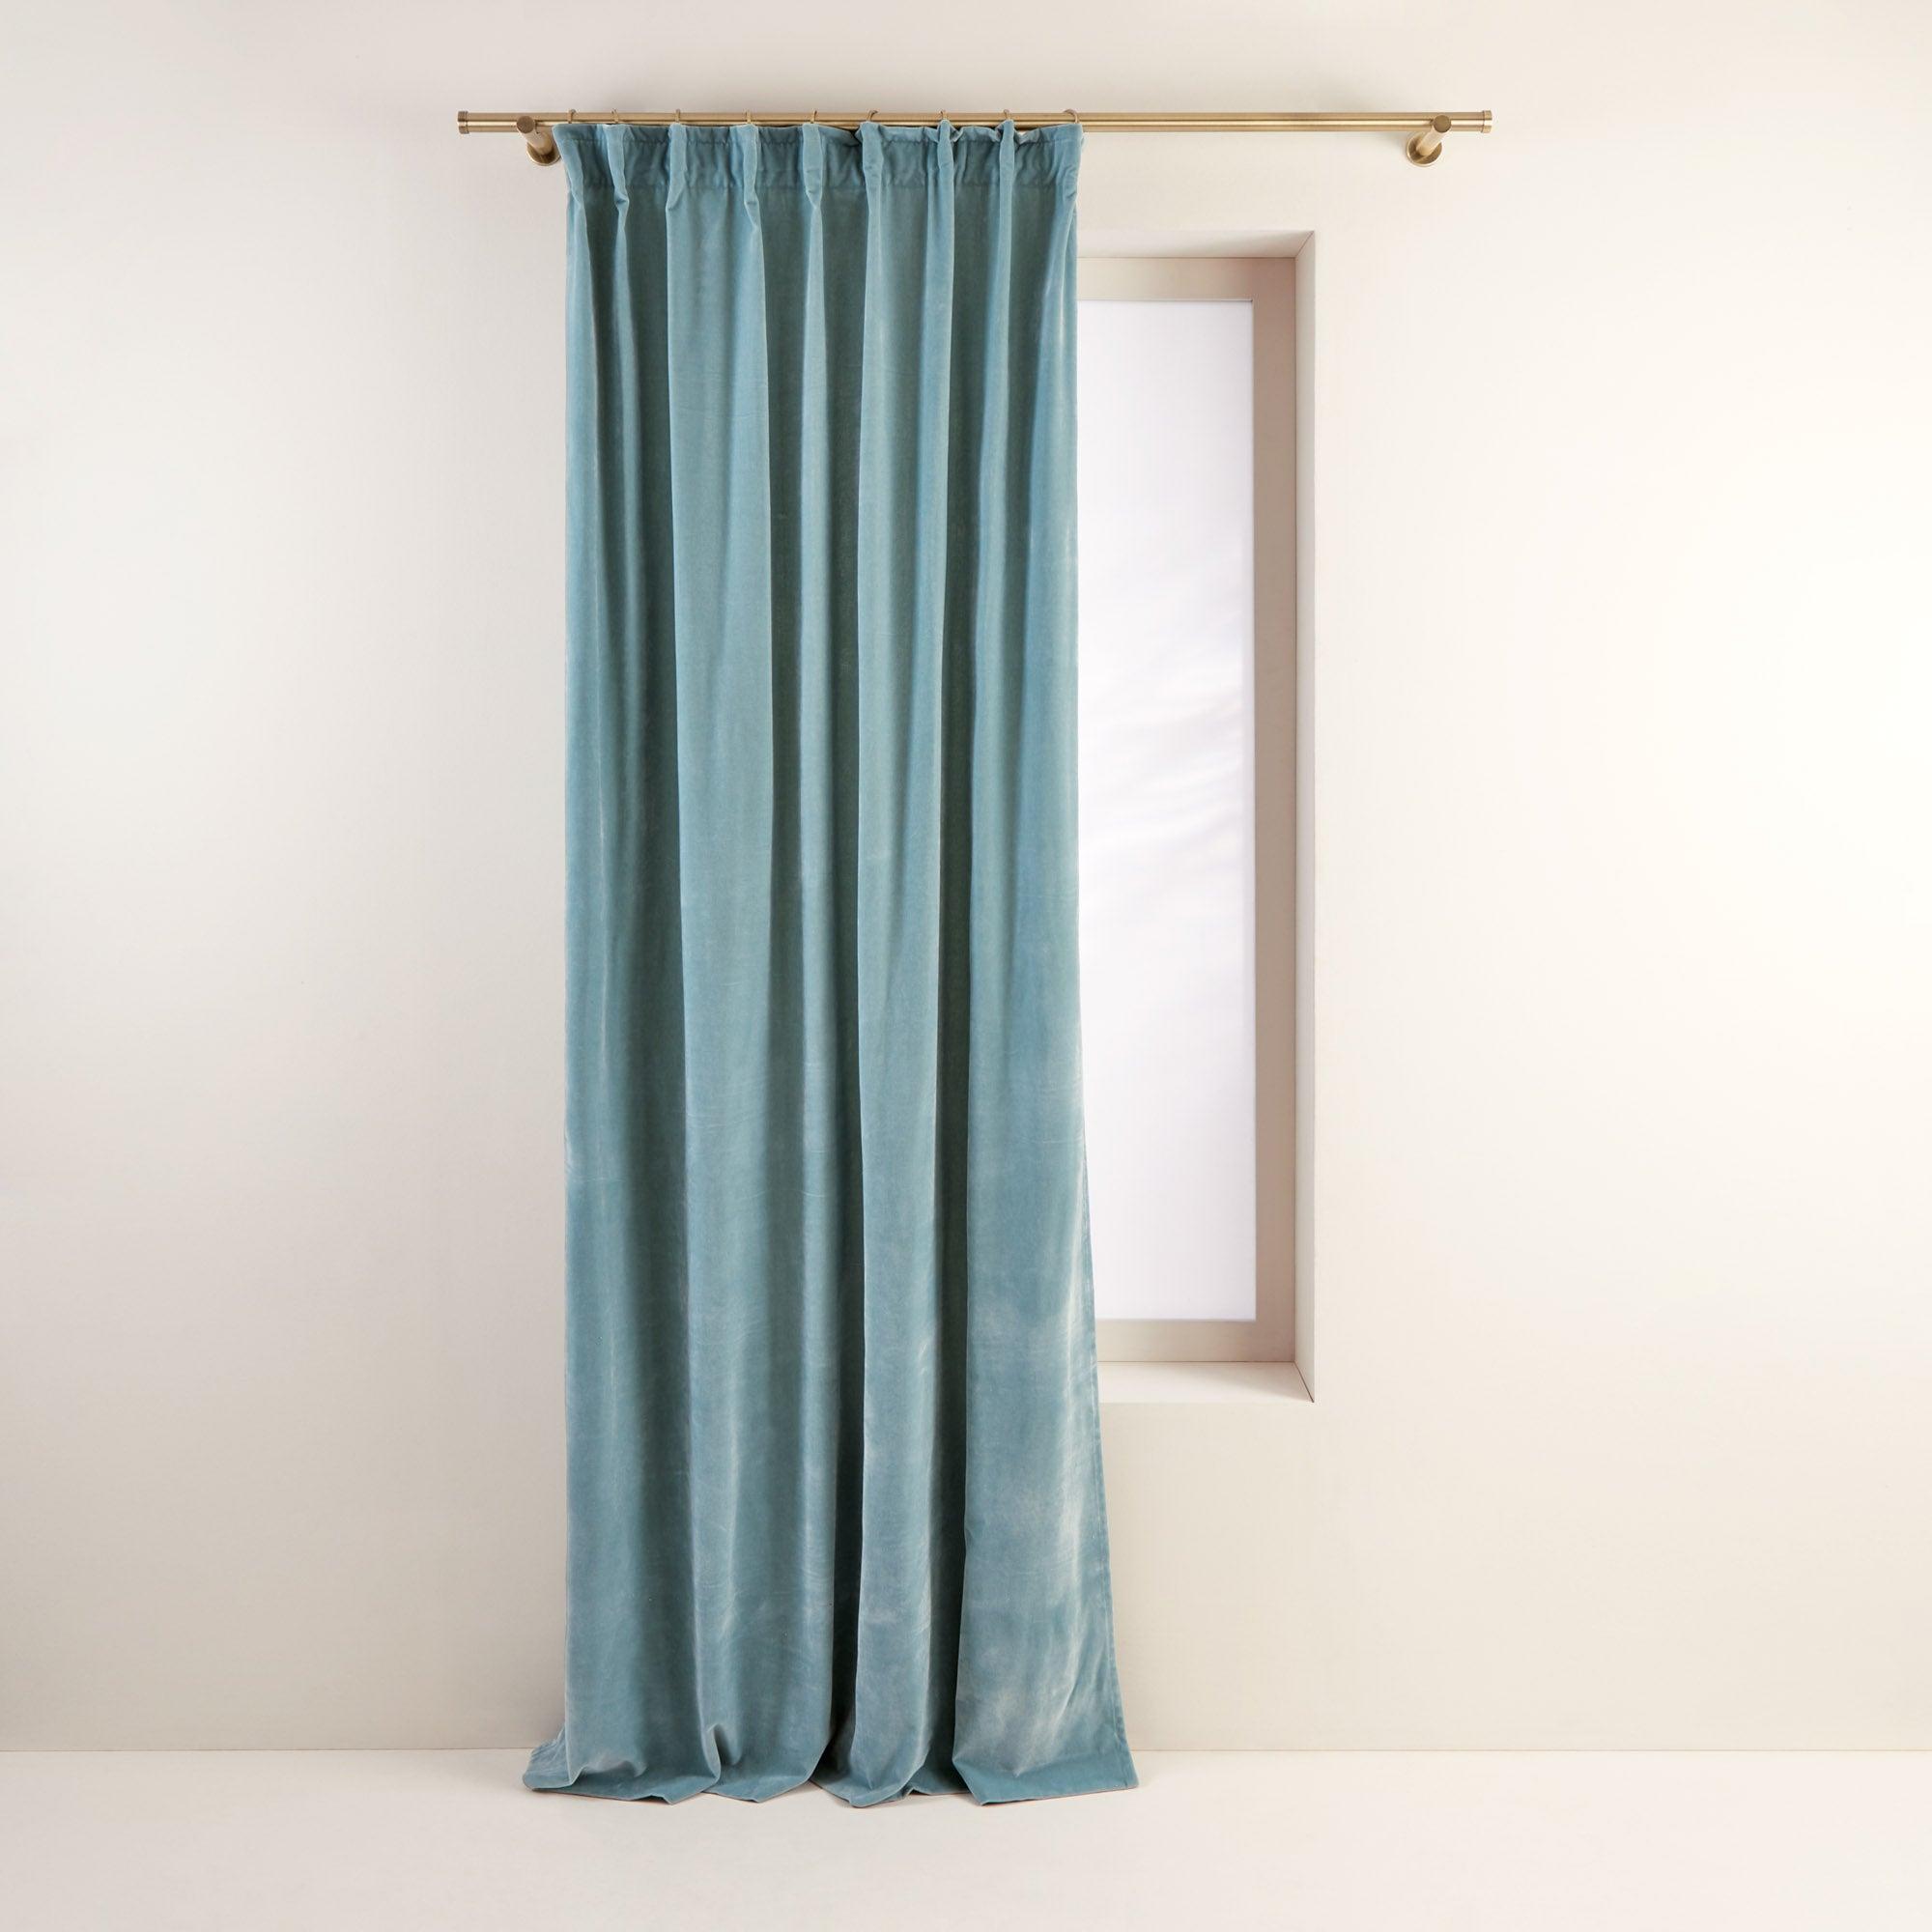 Rideau à ruban fronceur DARIO 134x350 cm Vert pale